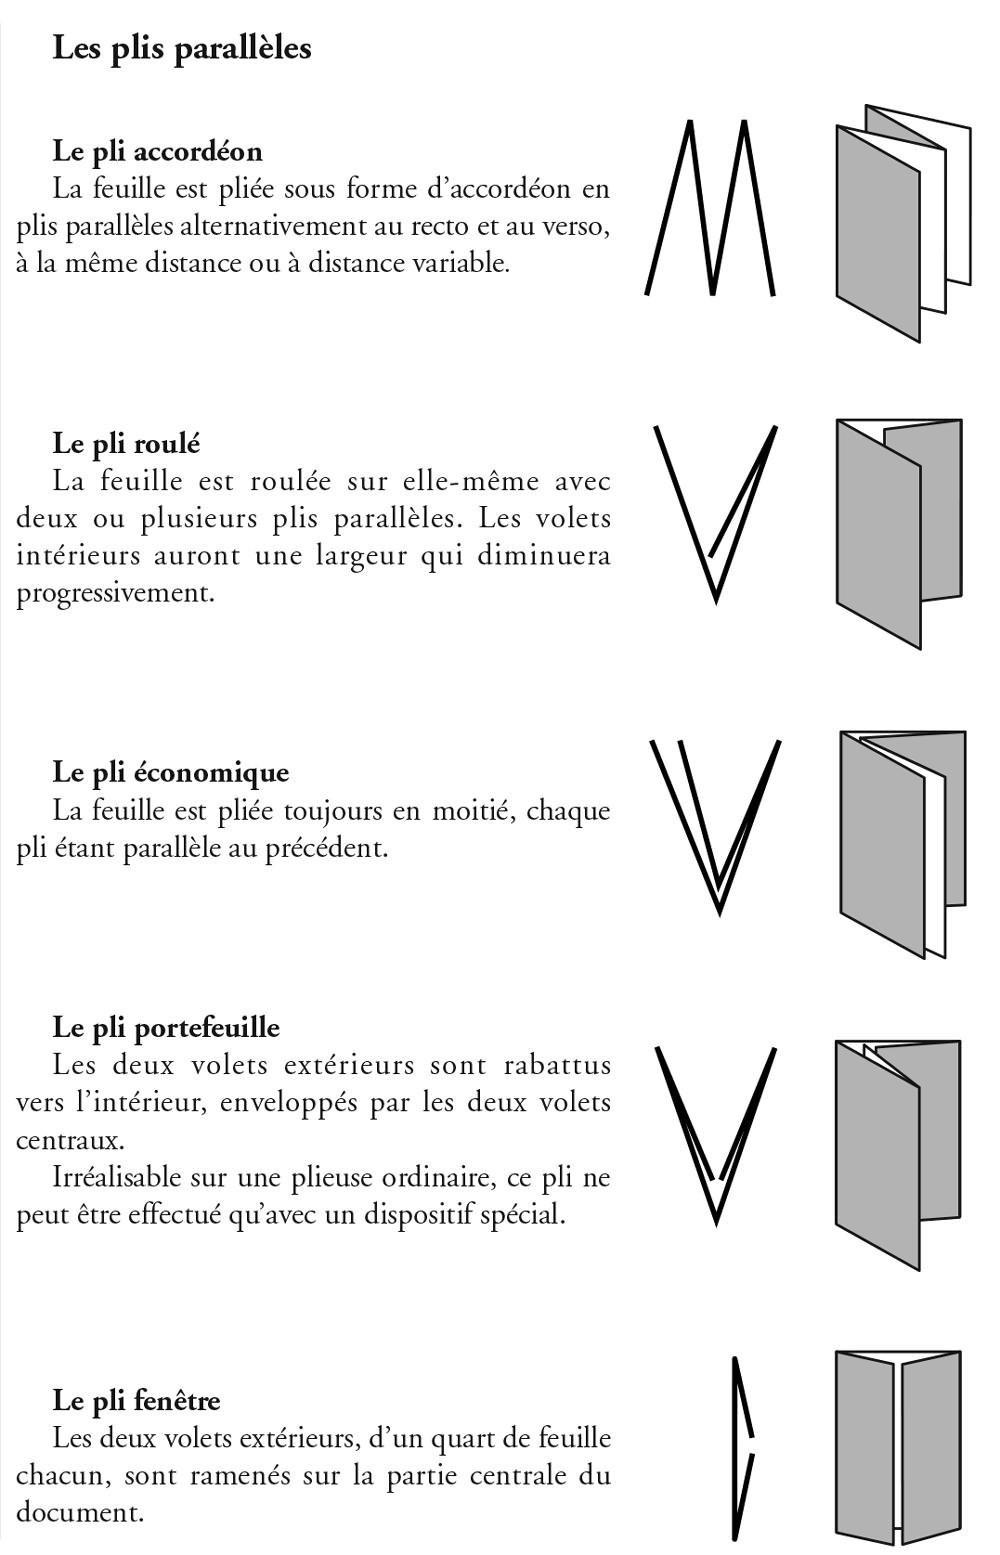 Les plis parallèles